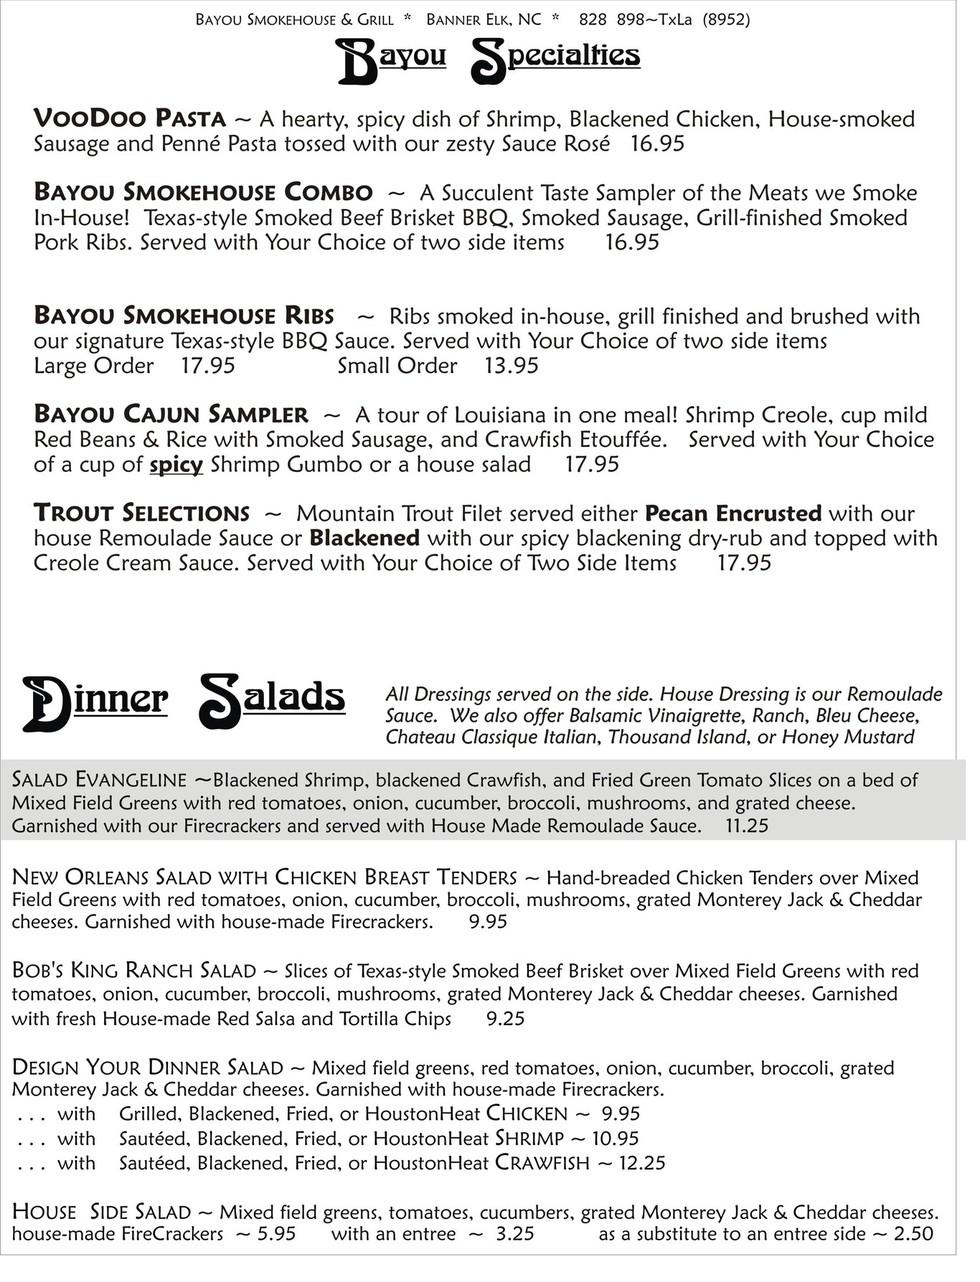 Section image may menu page 2